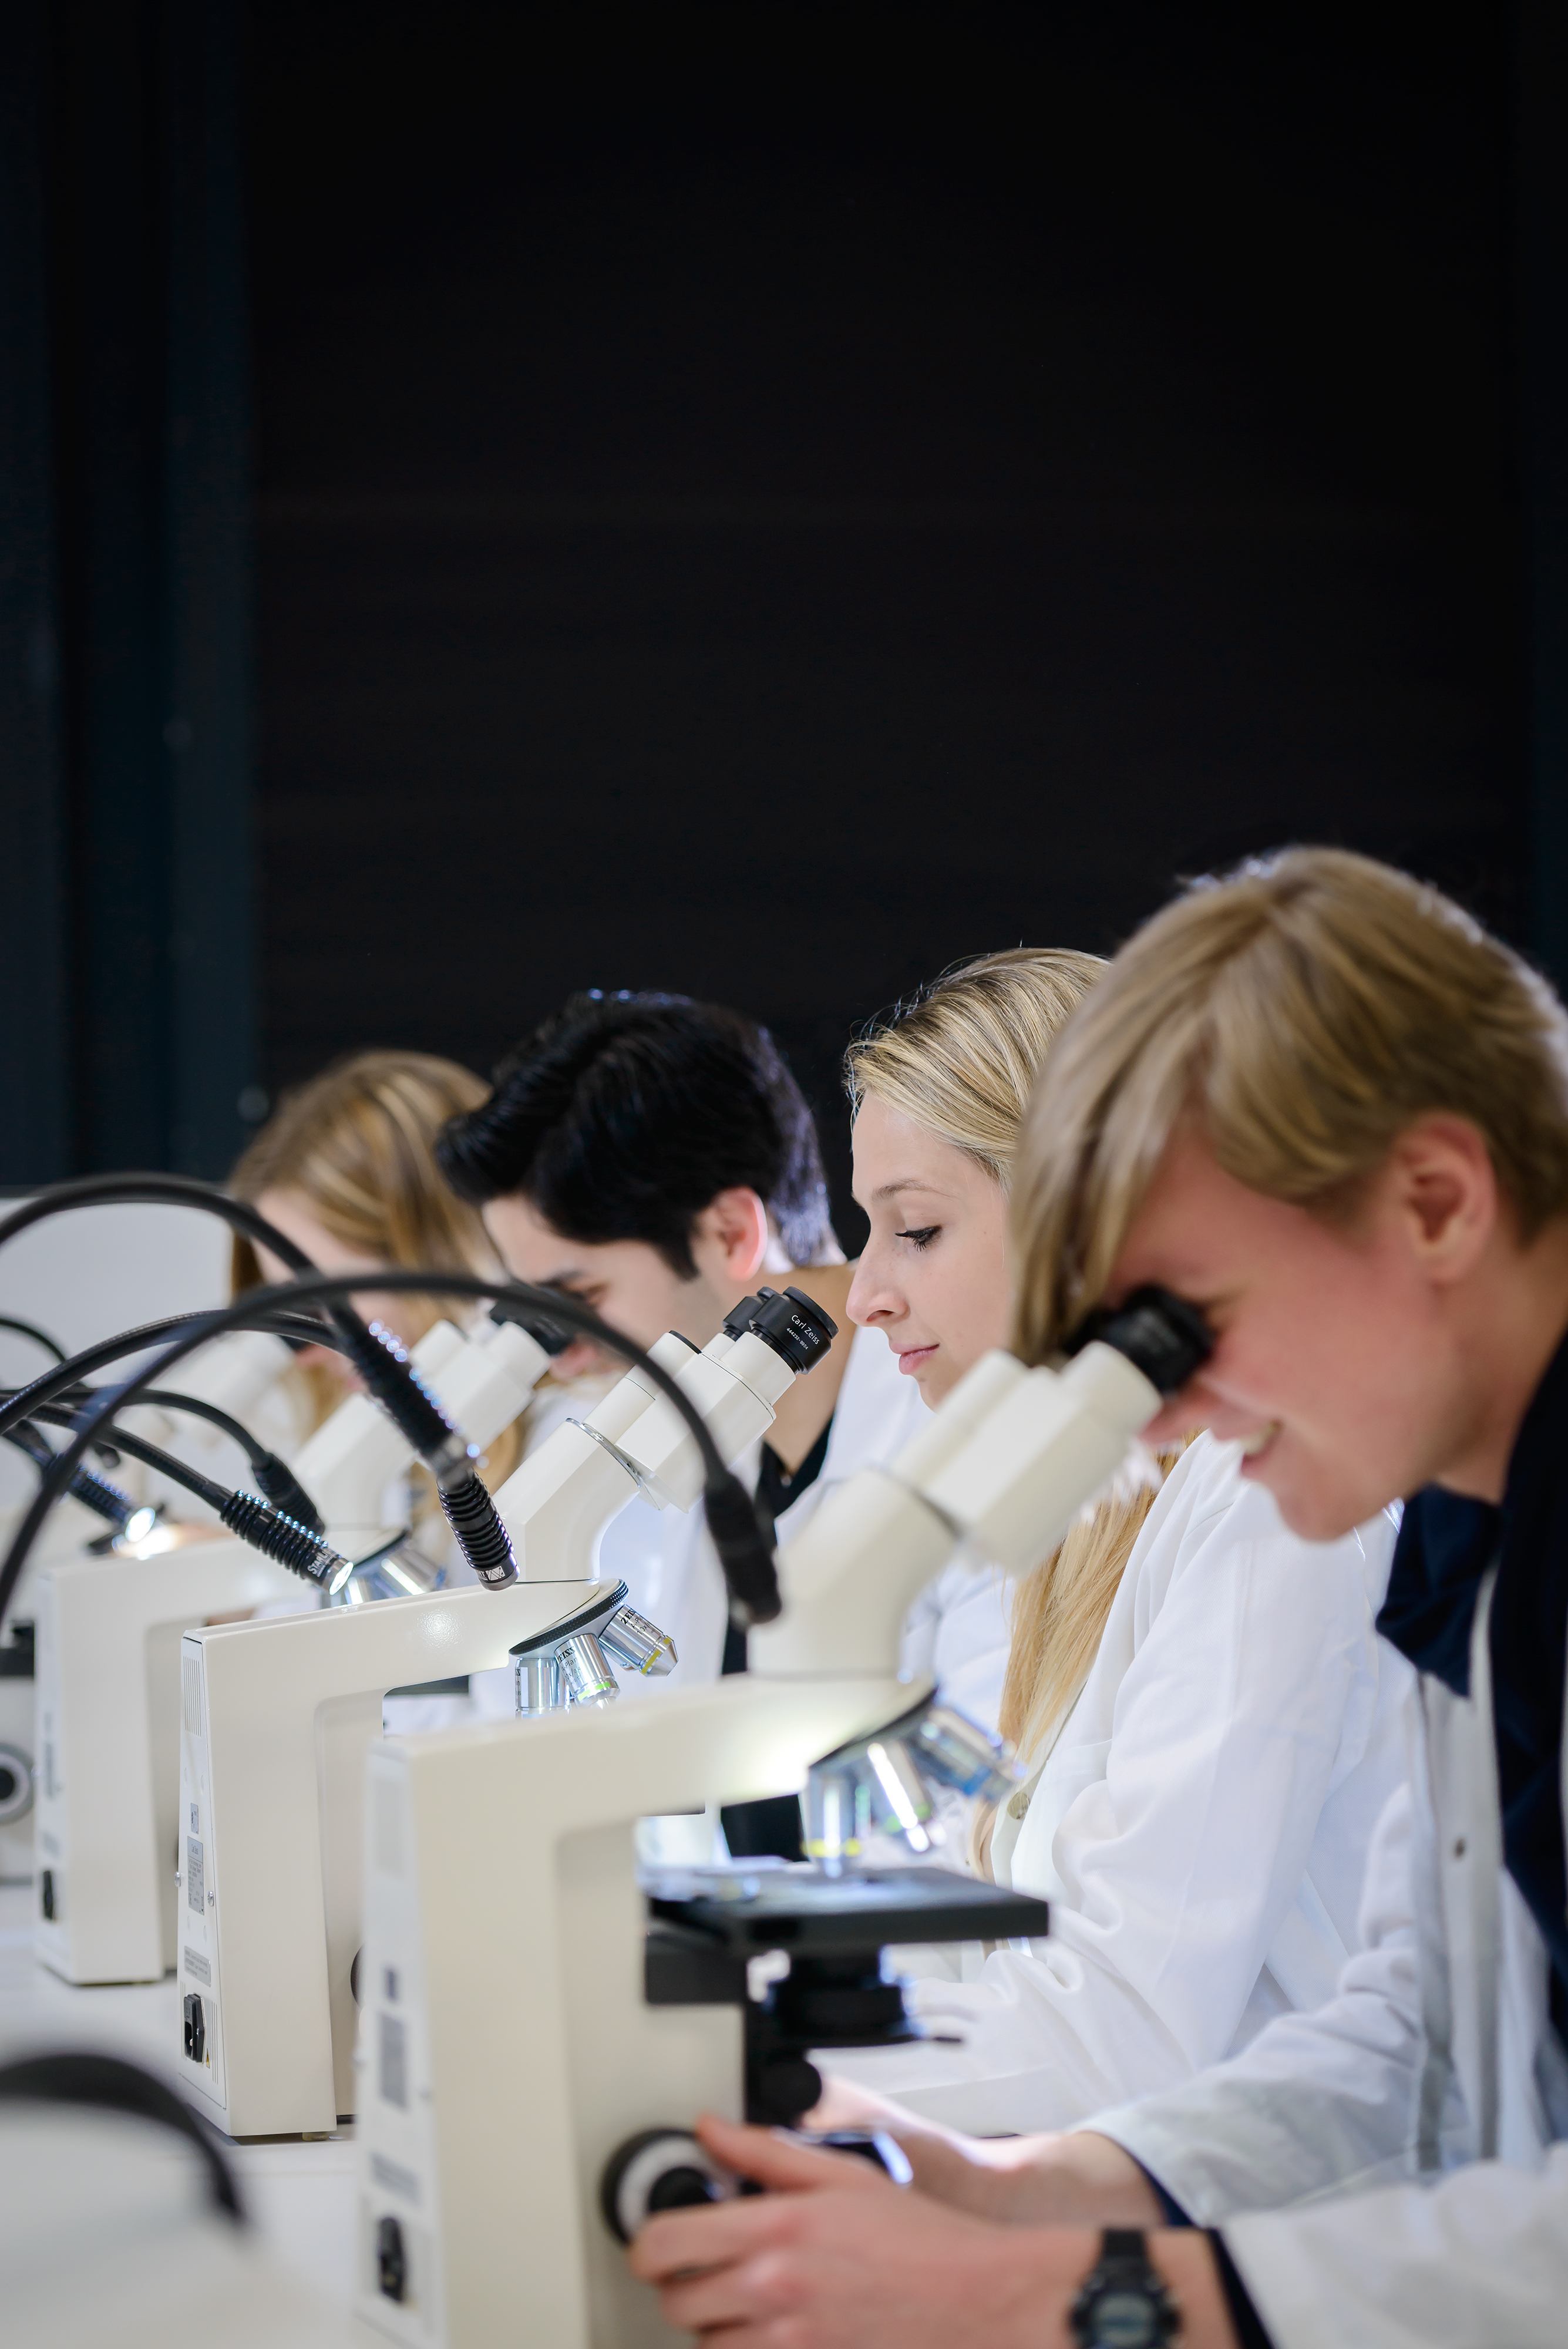 RUB---Mikroskop.jpg